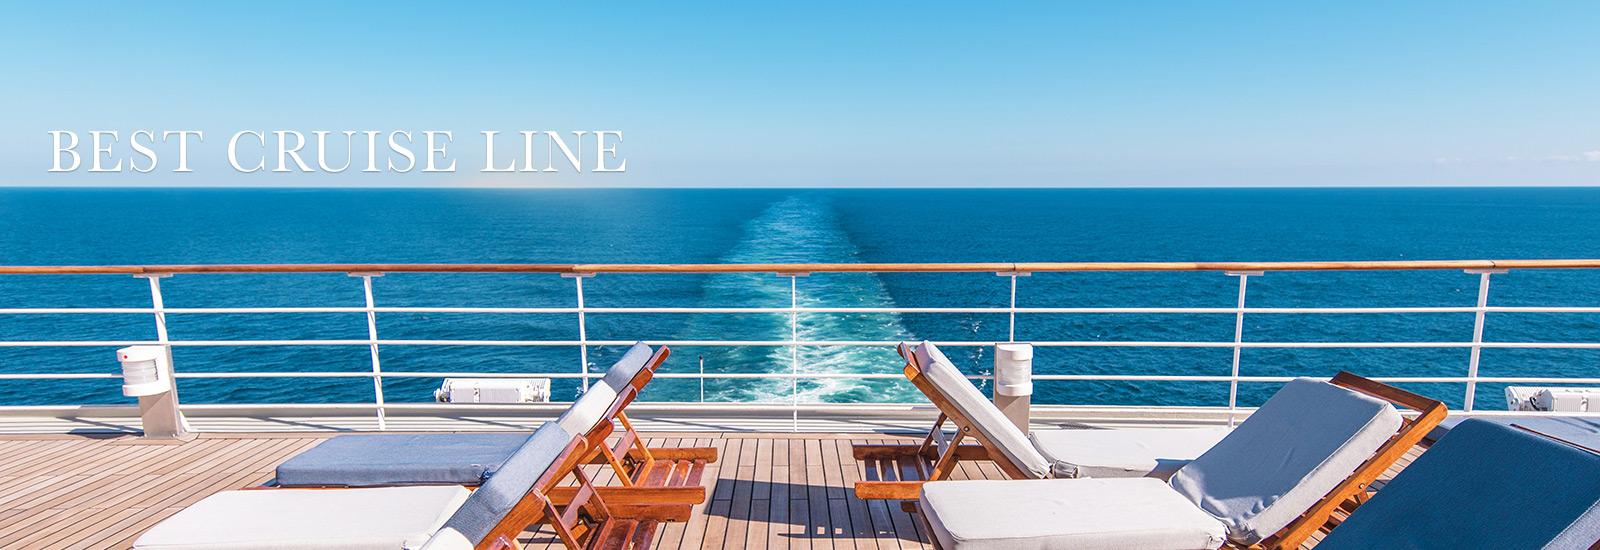 RCA Best Cruiseline